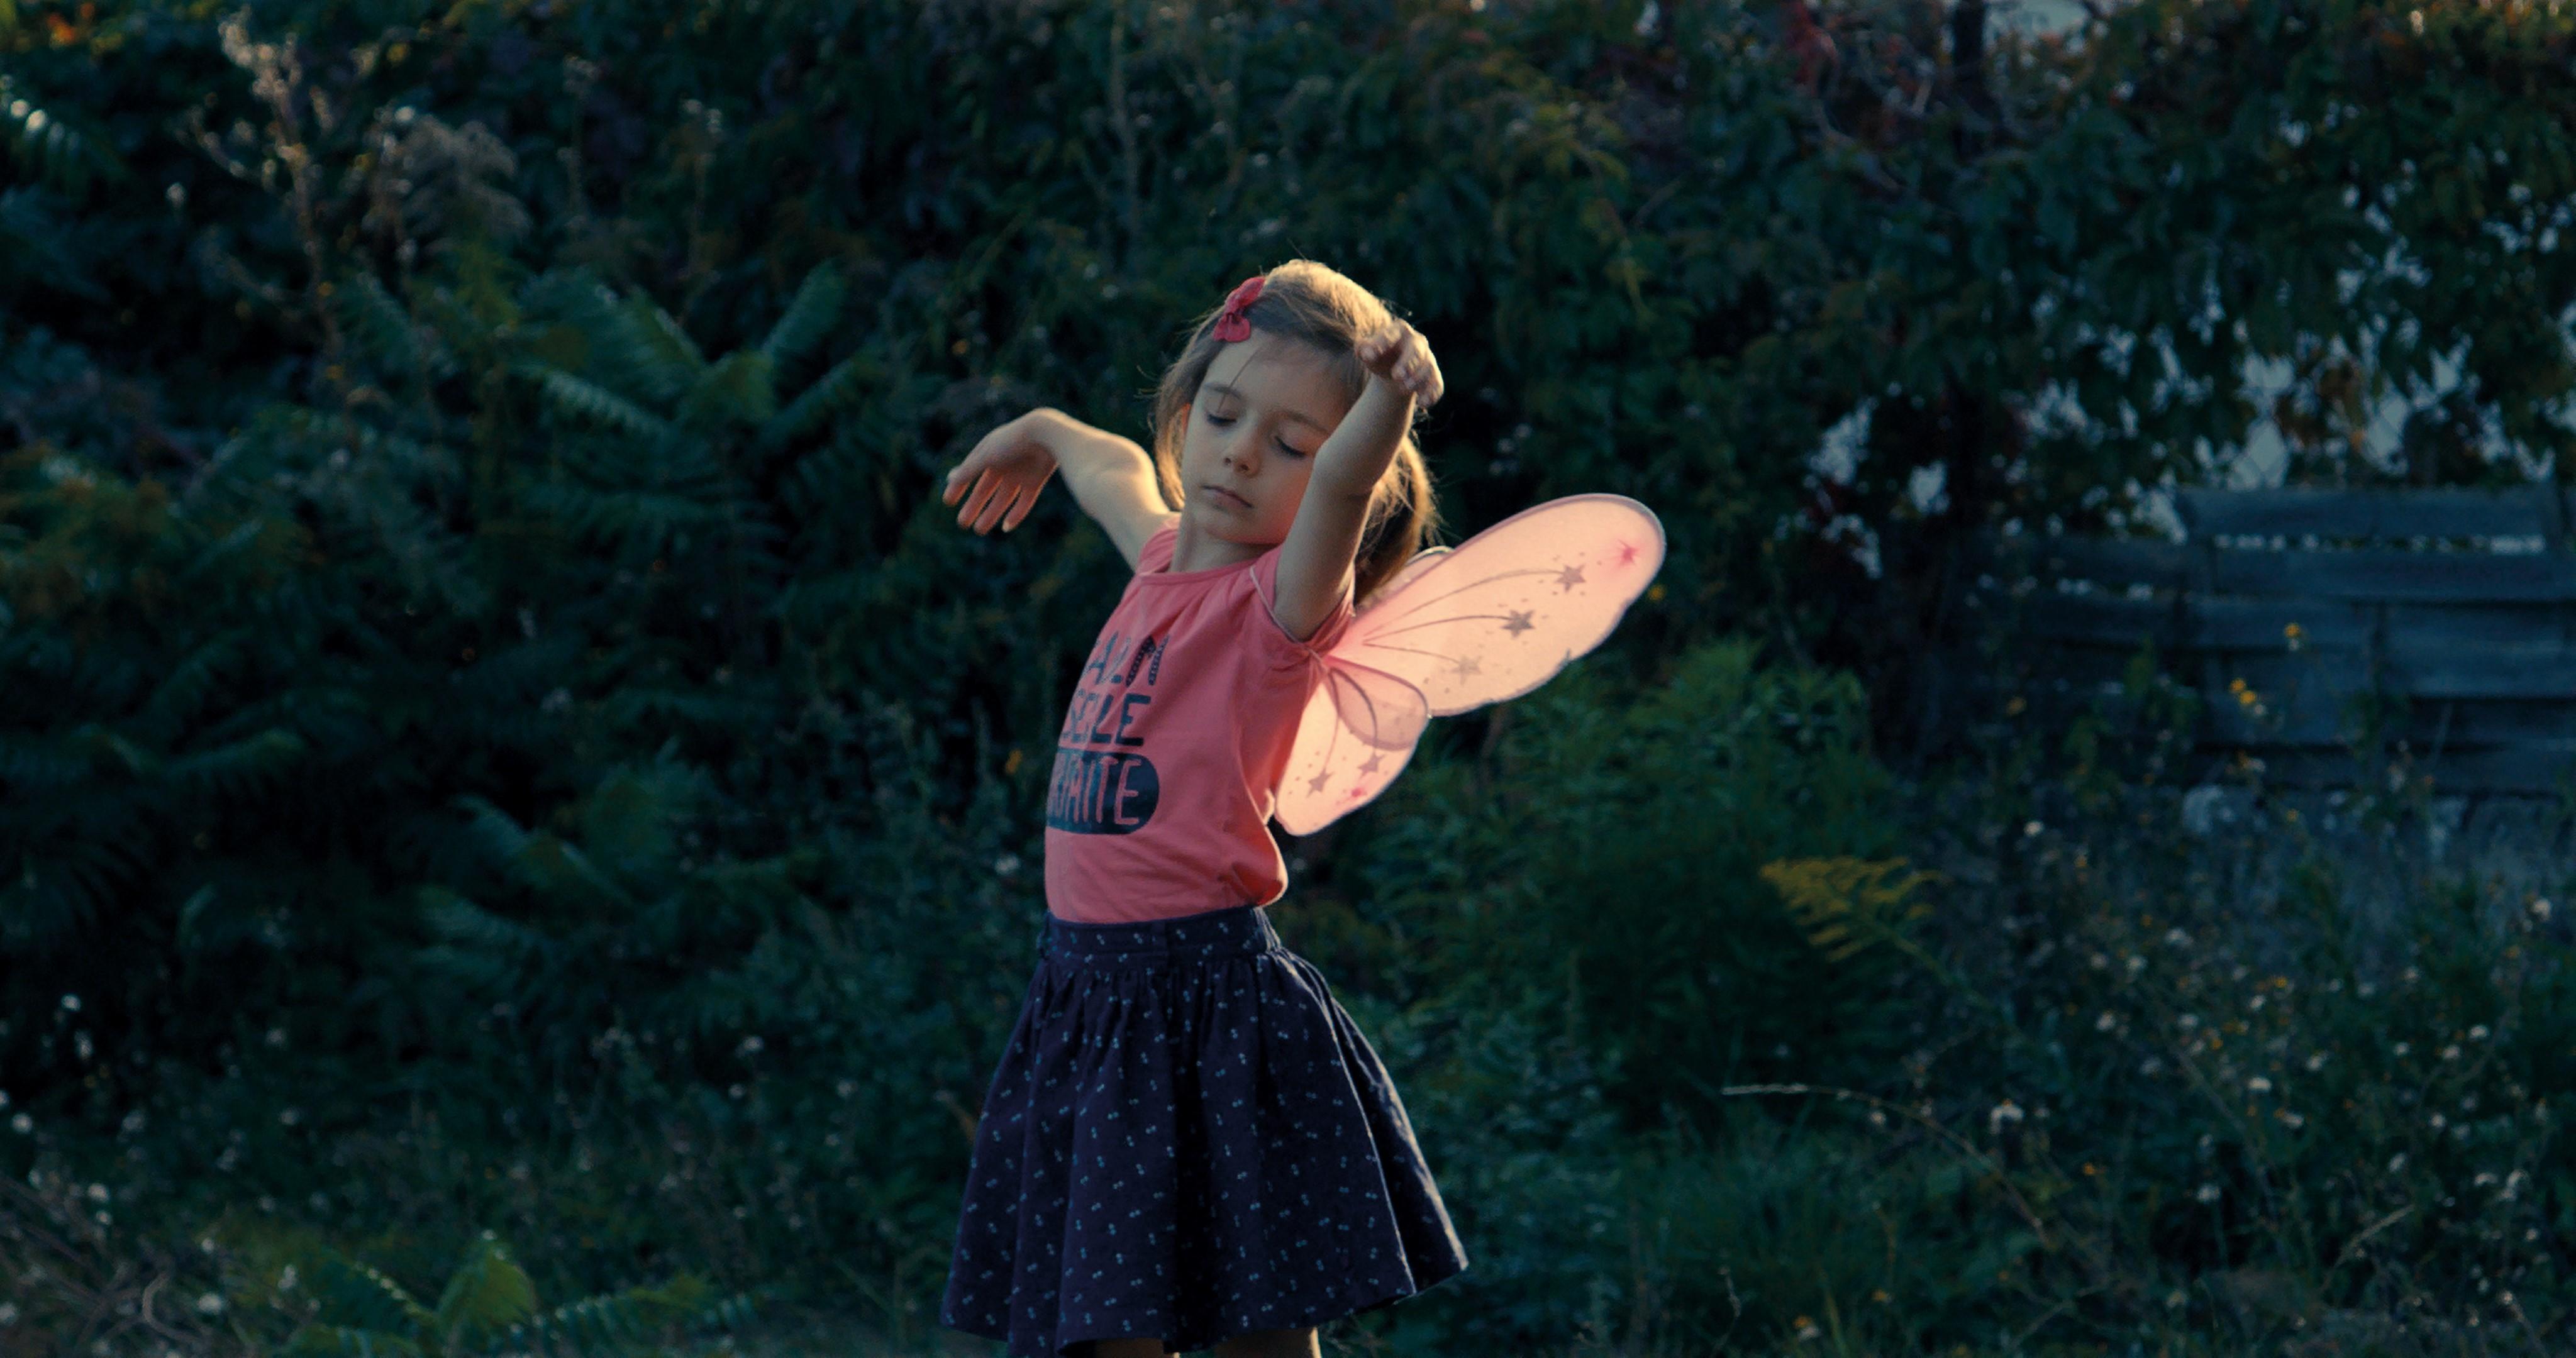 LittleGirl 1(c) AGAT FILMS & CIE _ ARTE France _ Final Cut For real